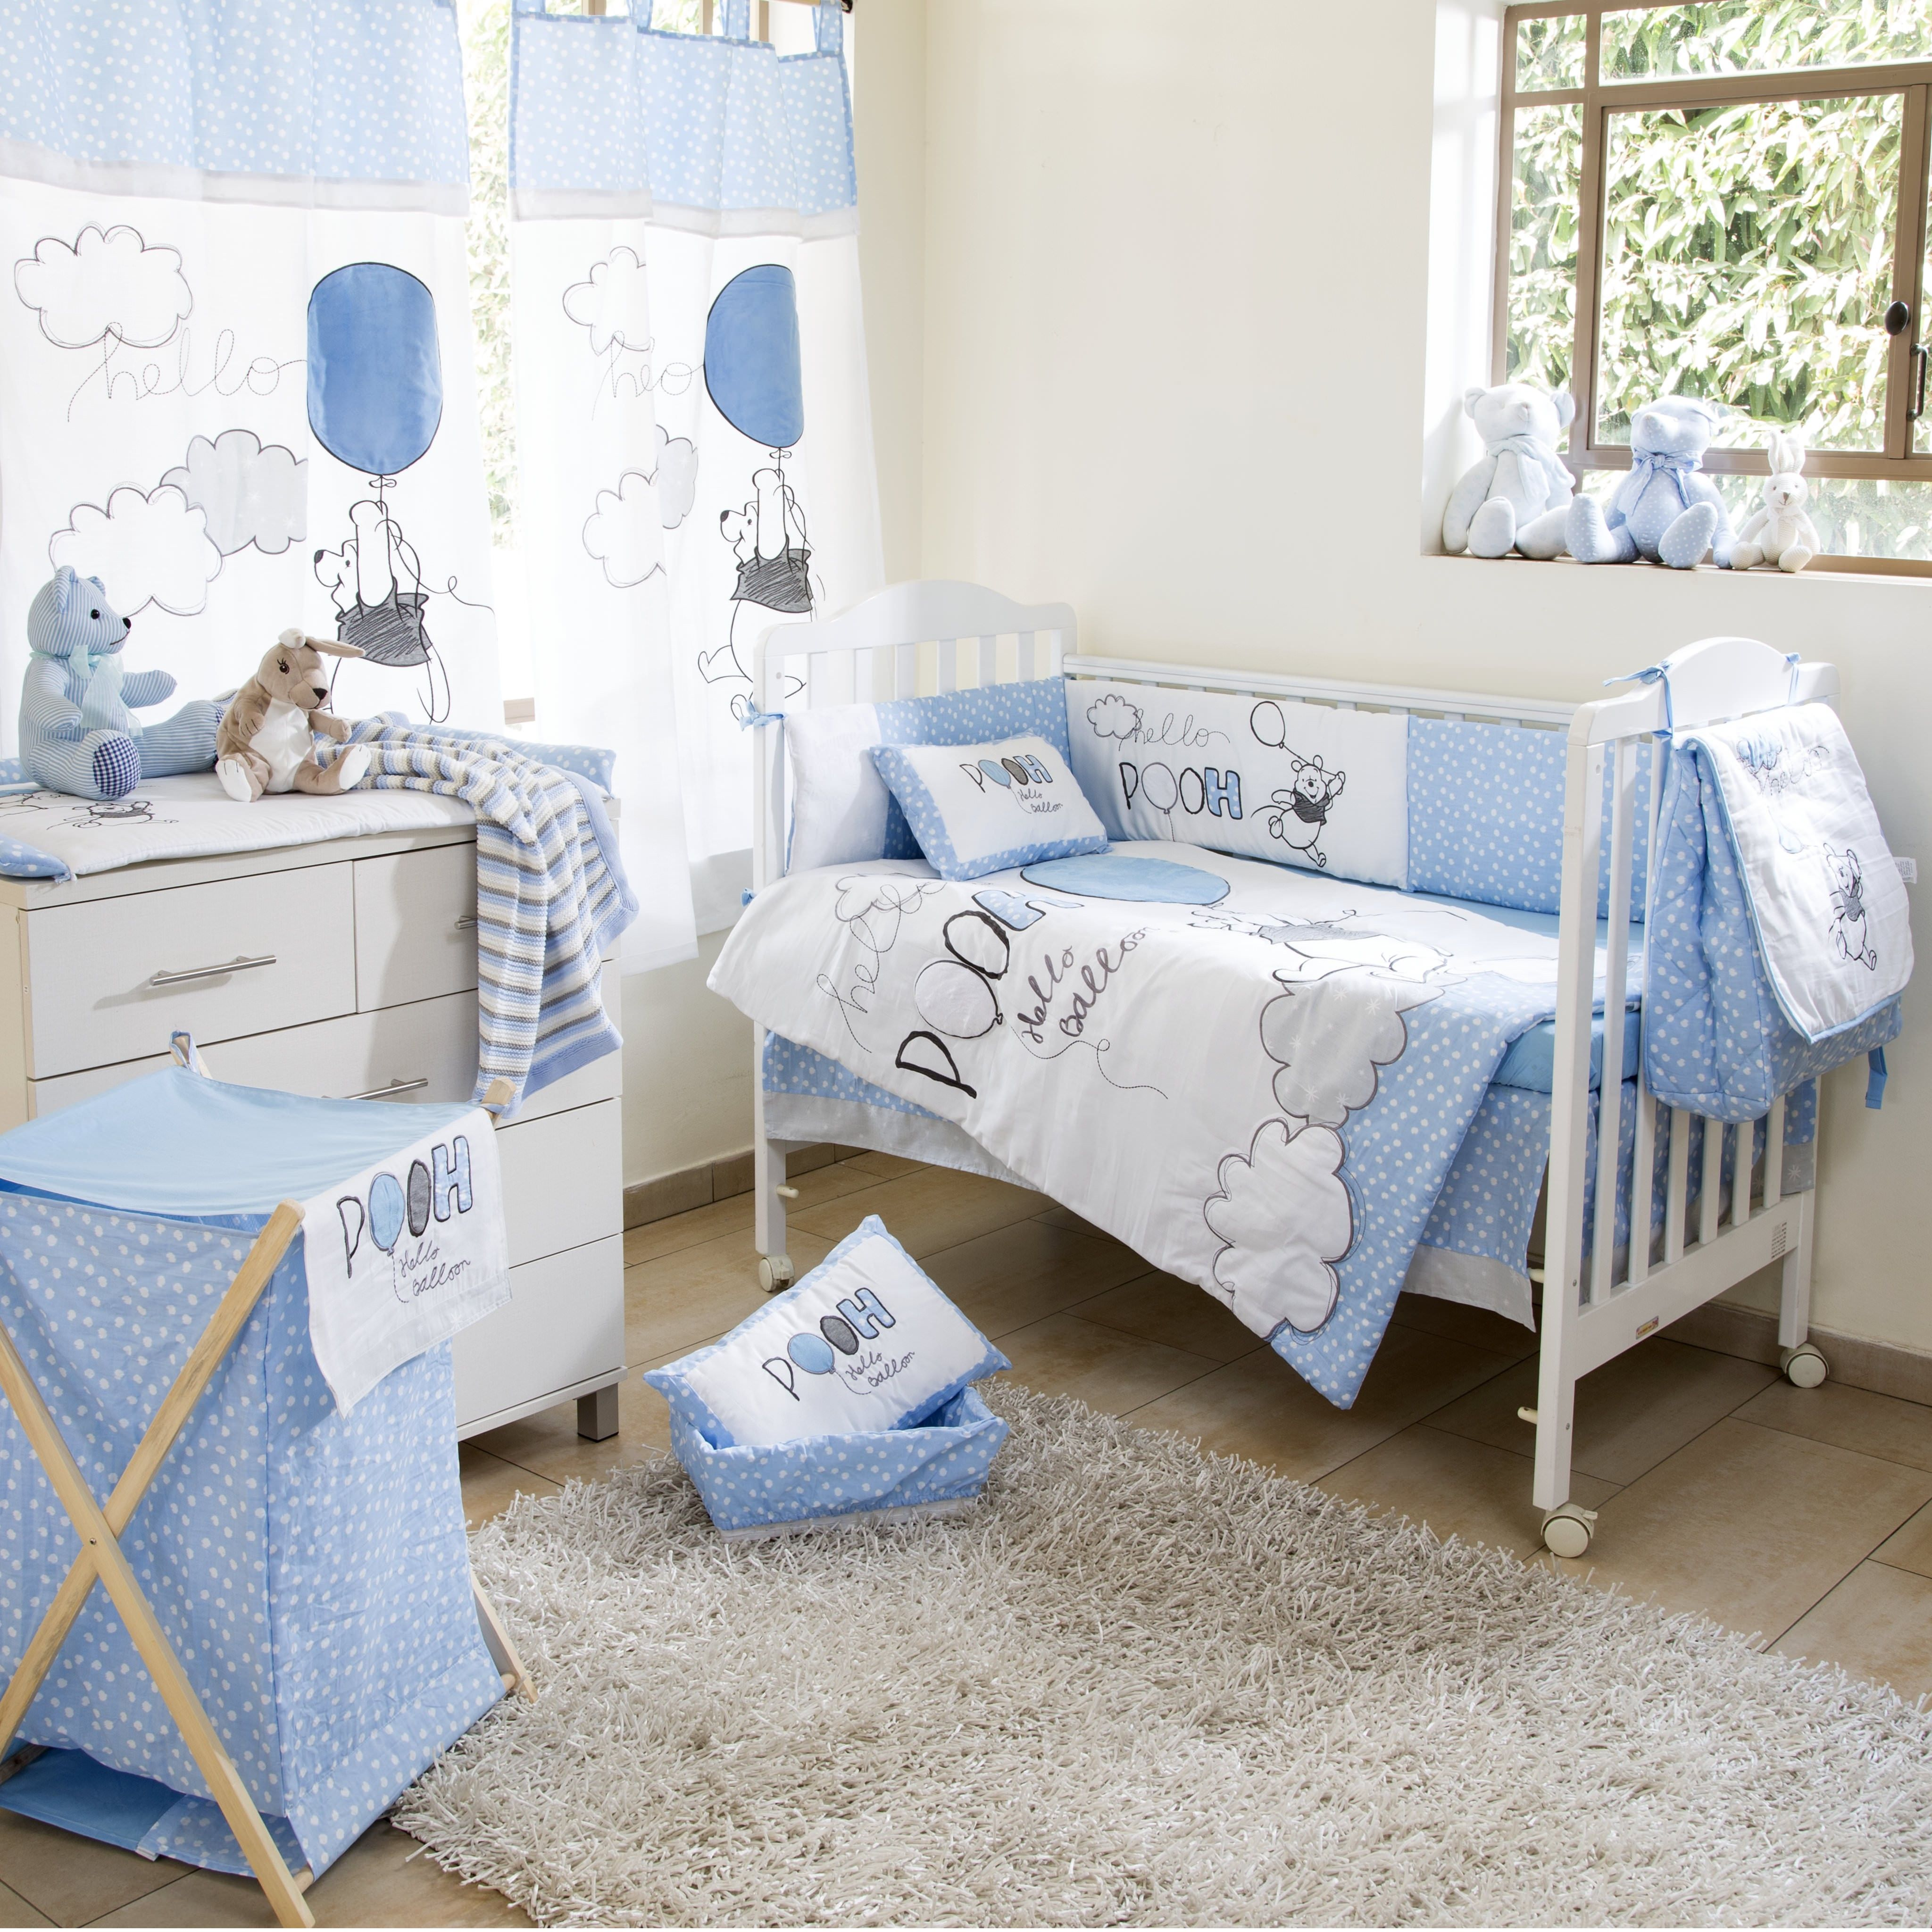 disney blue winnie the pooh play crib bedding